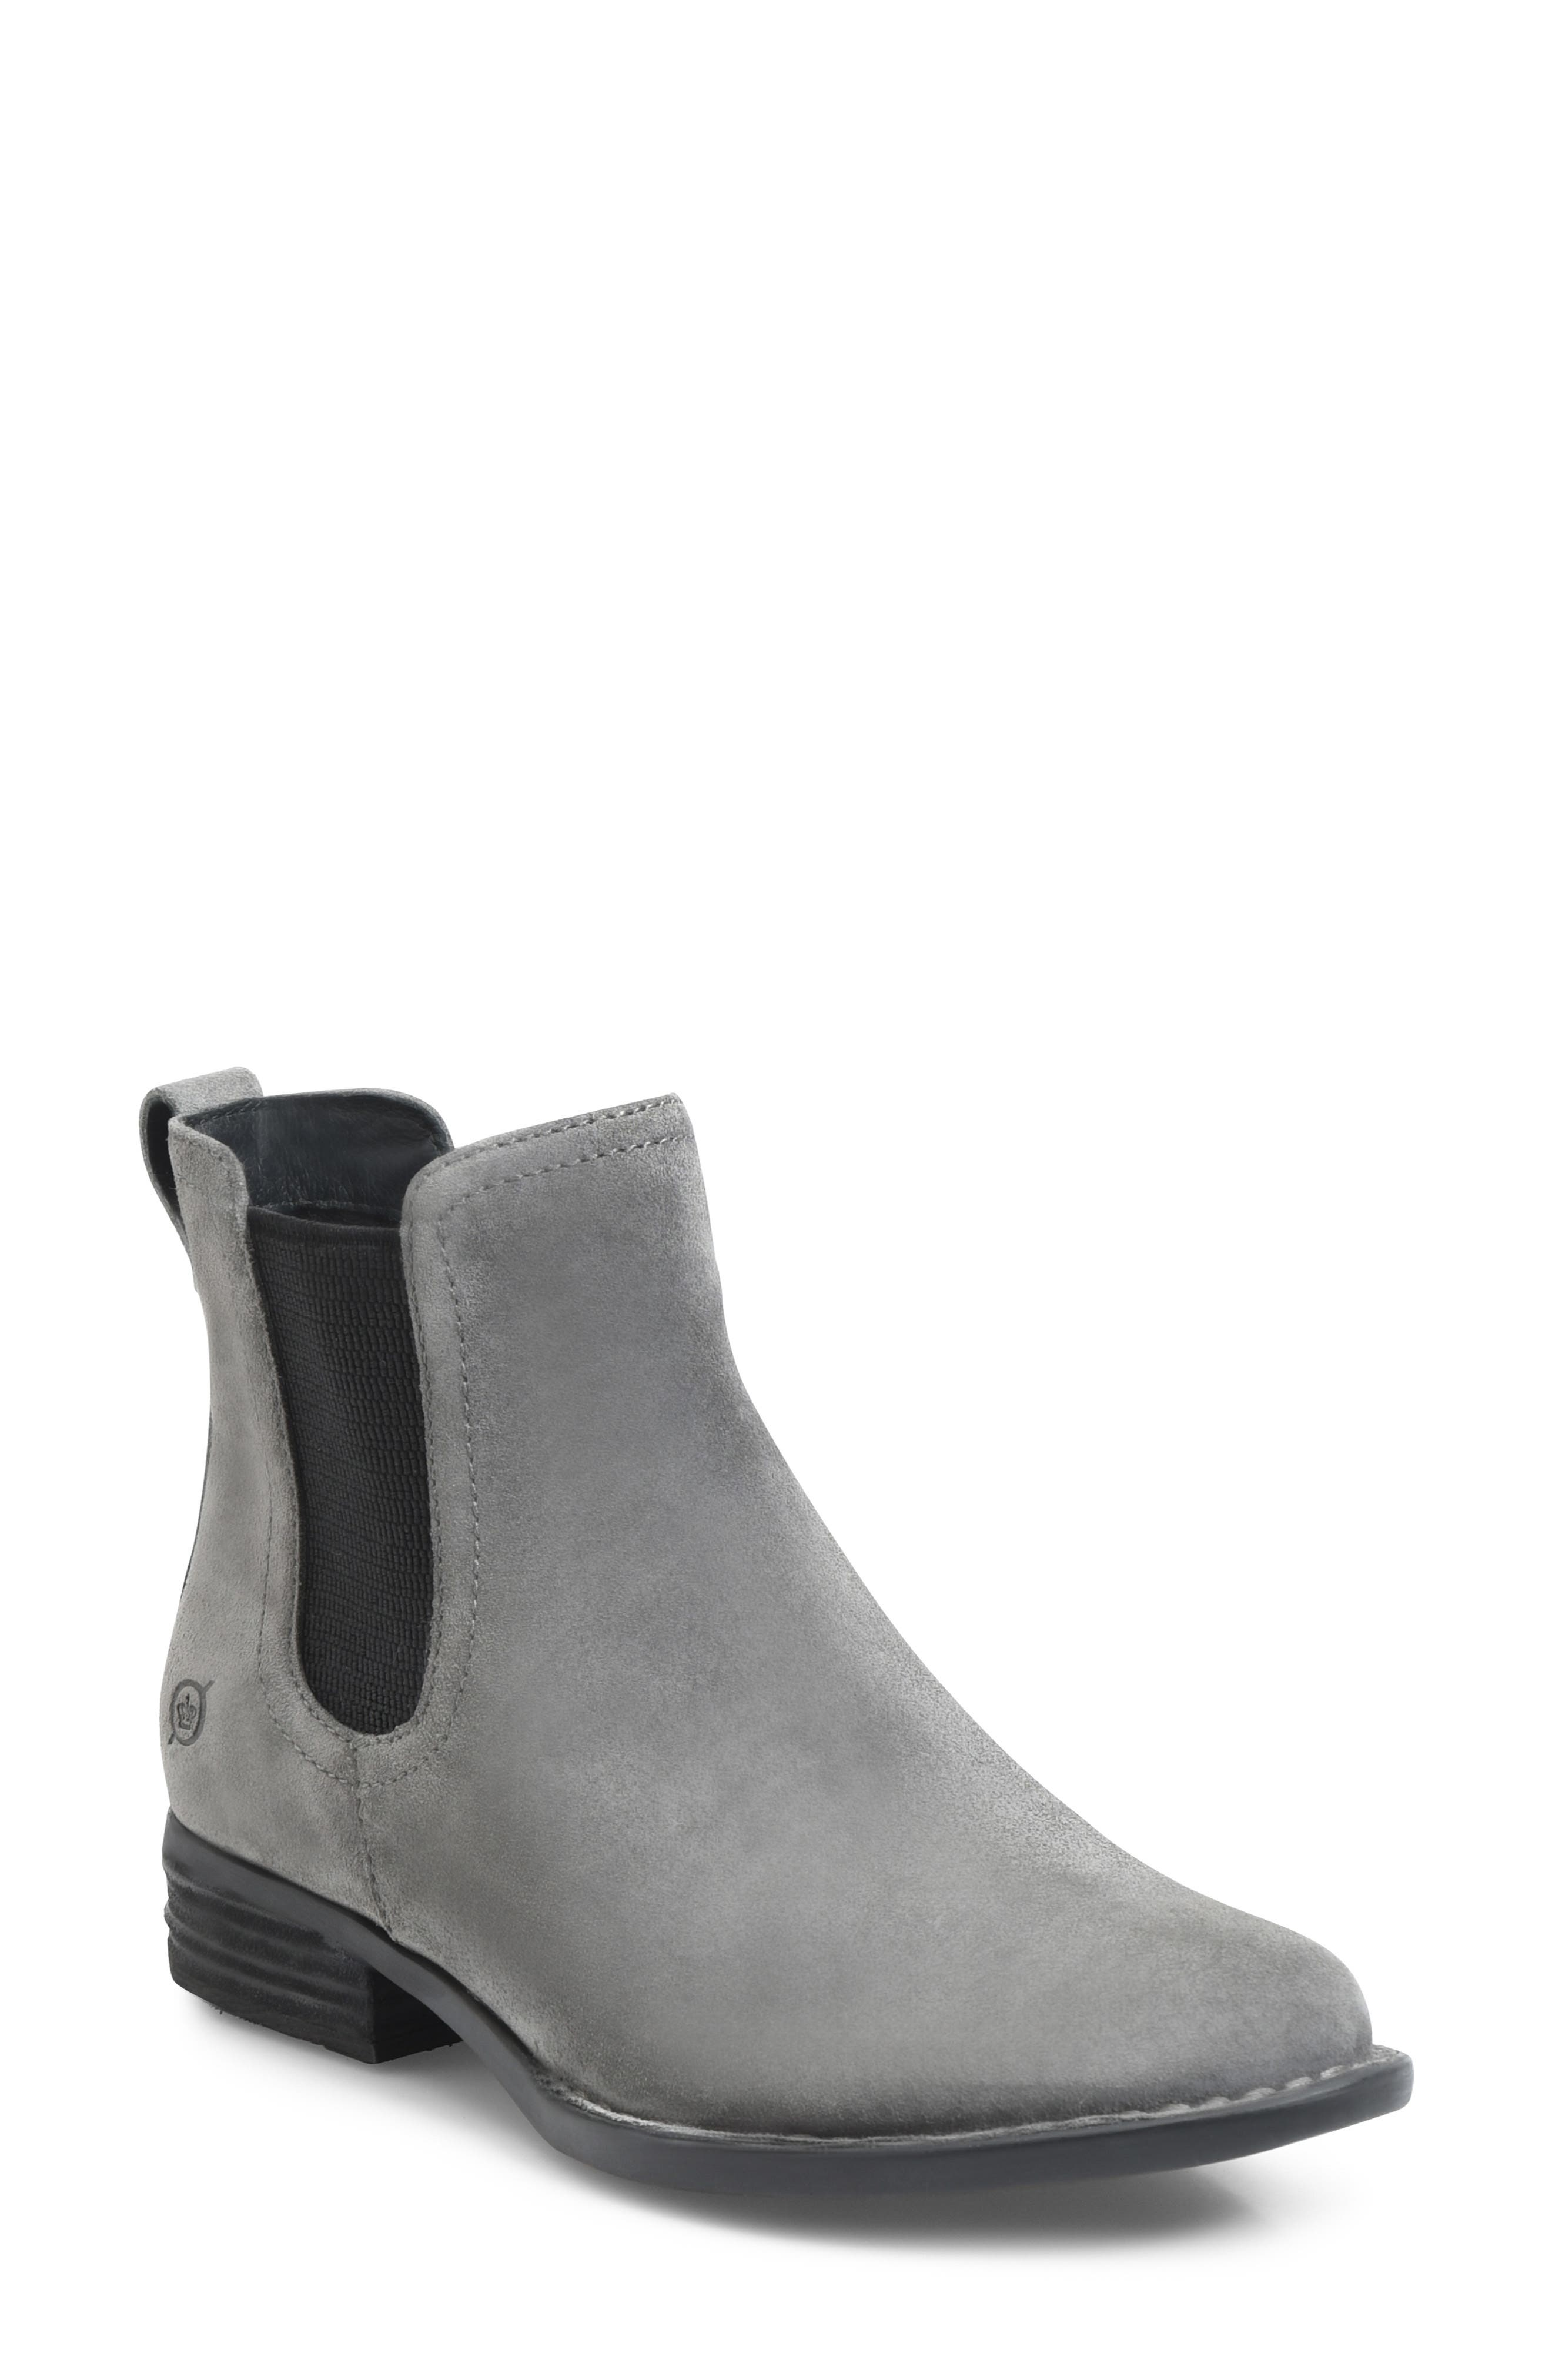 B?rn Casco Chelsea Boot- Grey